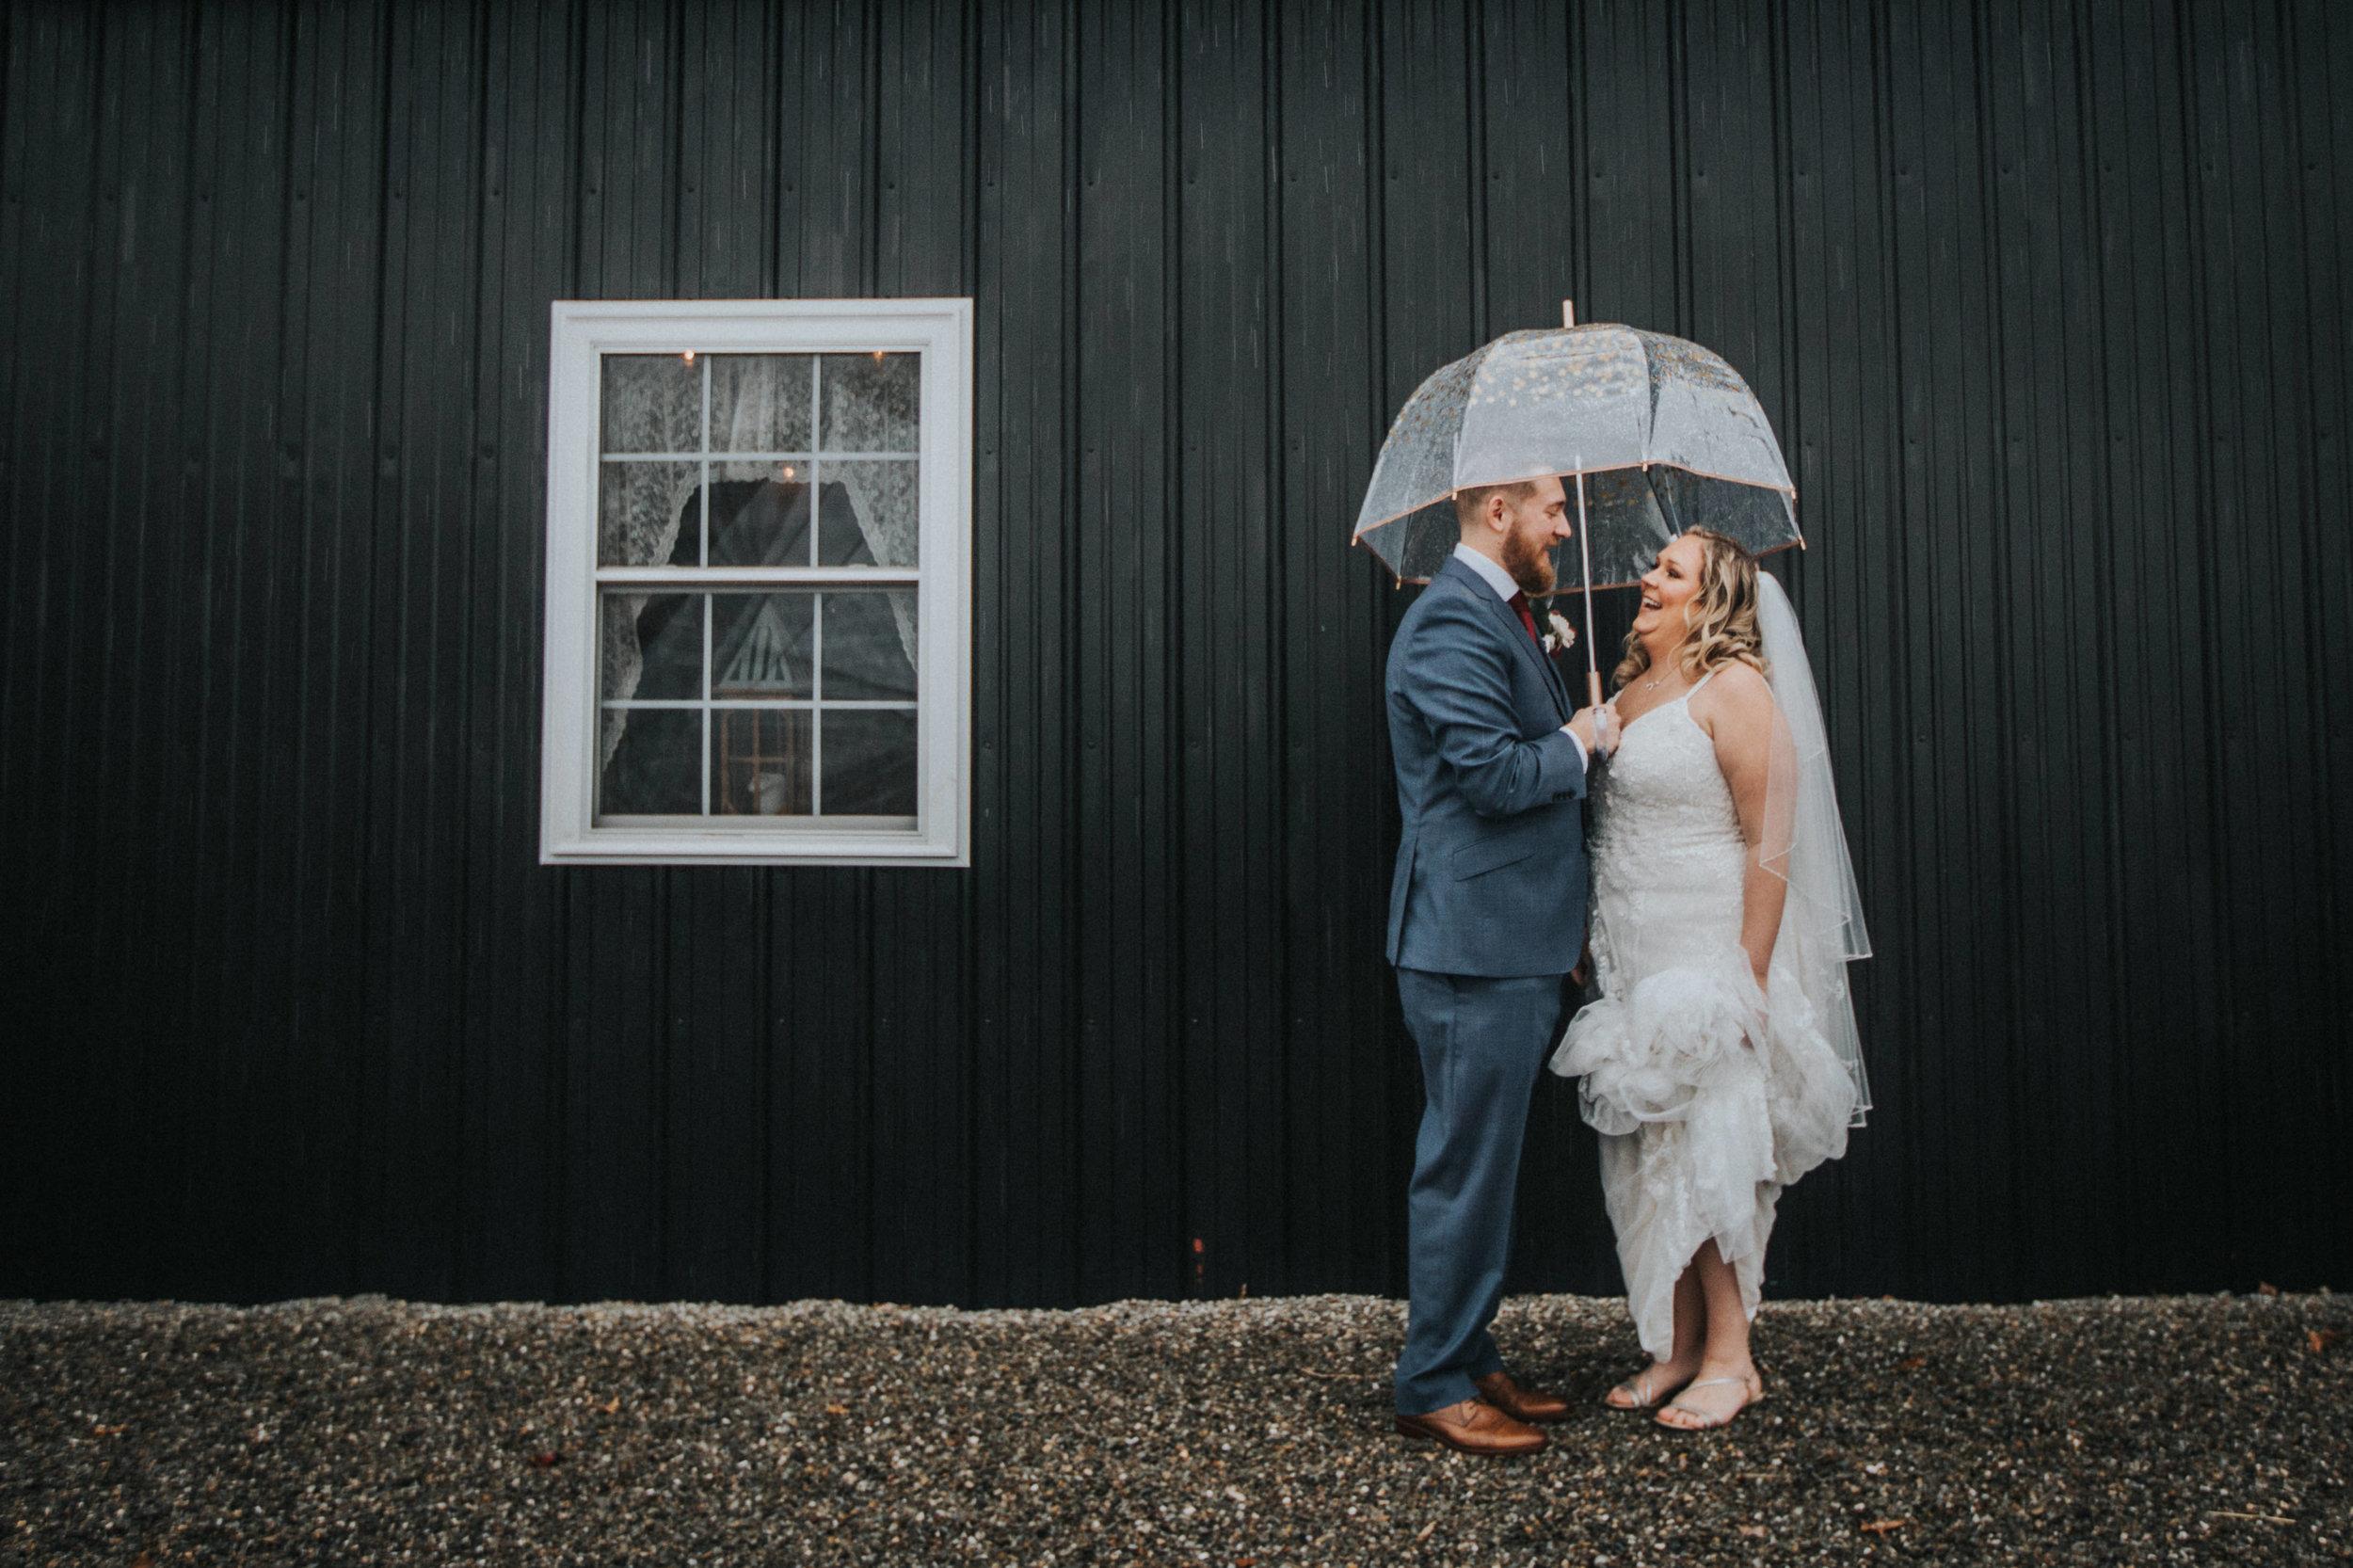 Cecil-Creek-Farm-Wedding-Jenna-Lynn-Photography-Laura&Joe-Bride&Grom-29.jpg